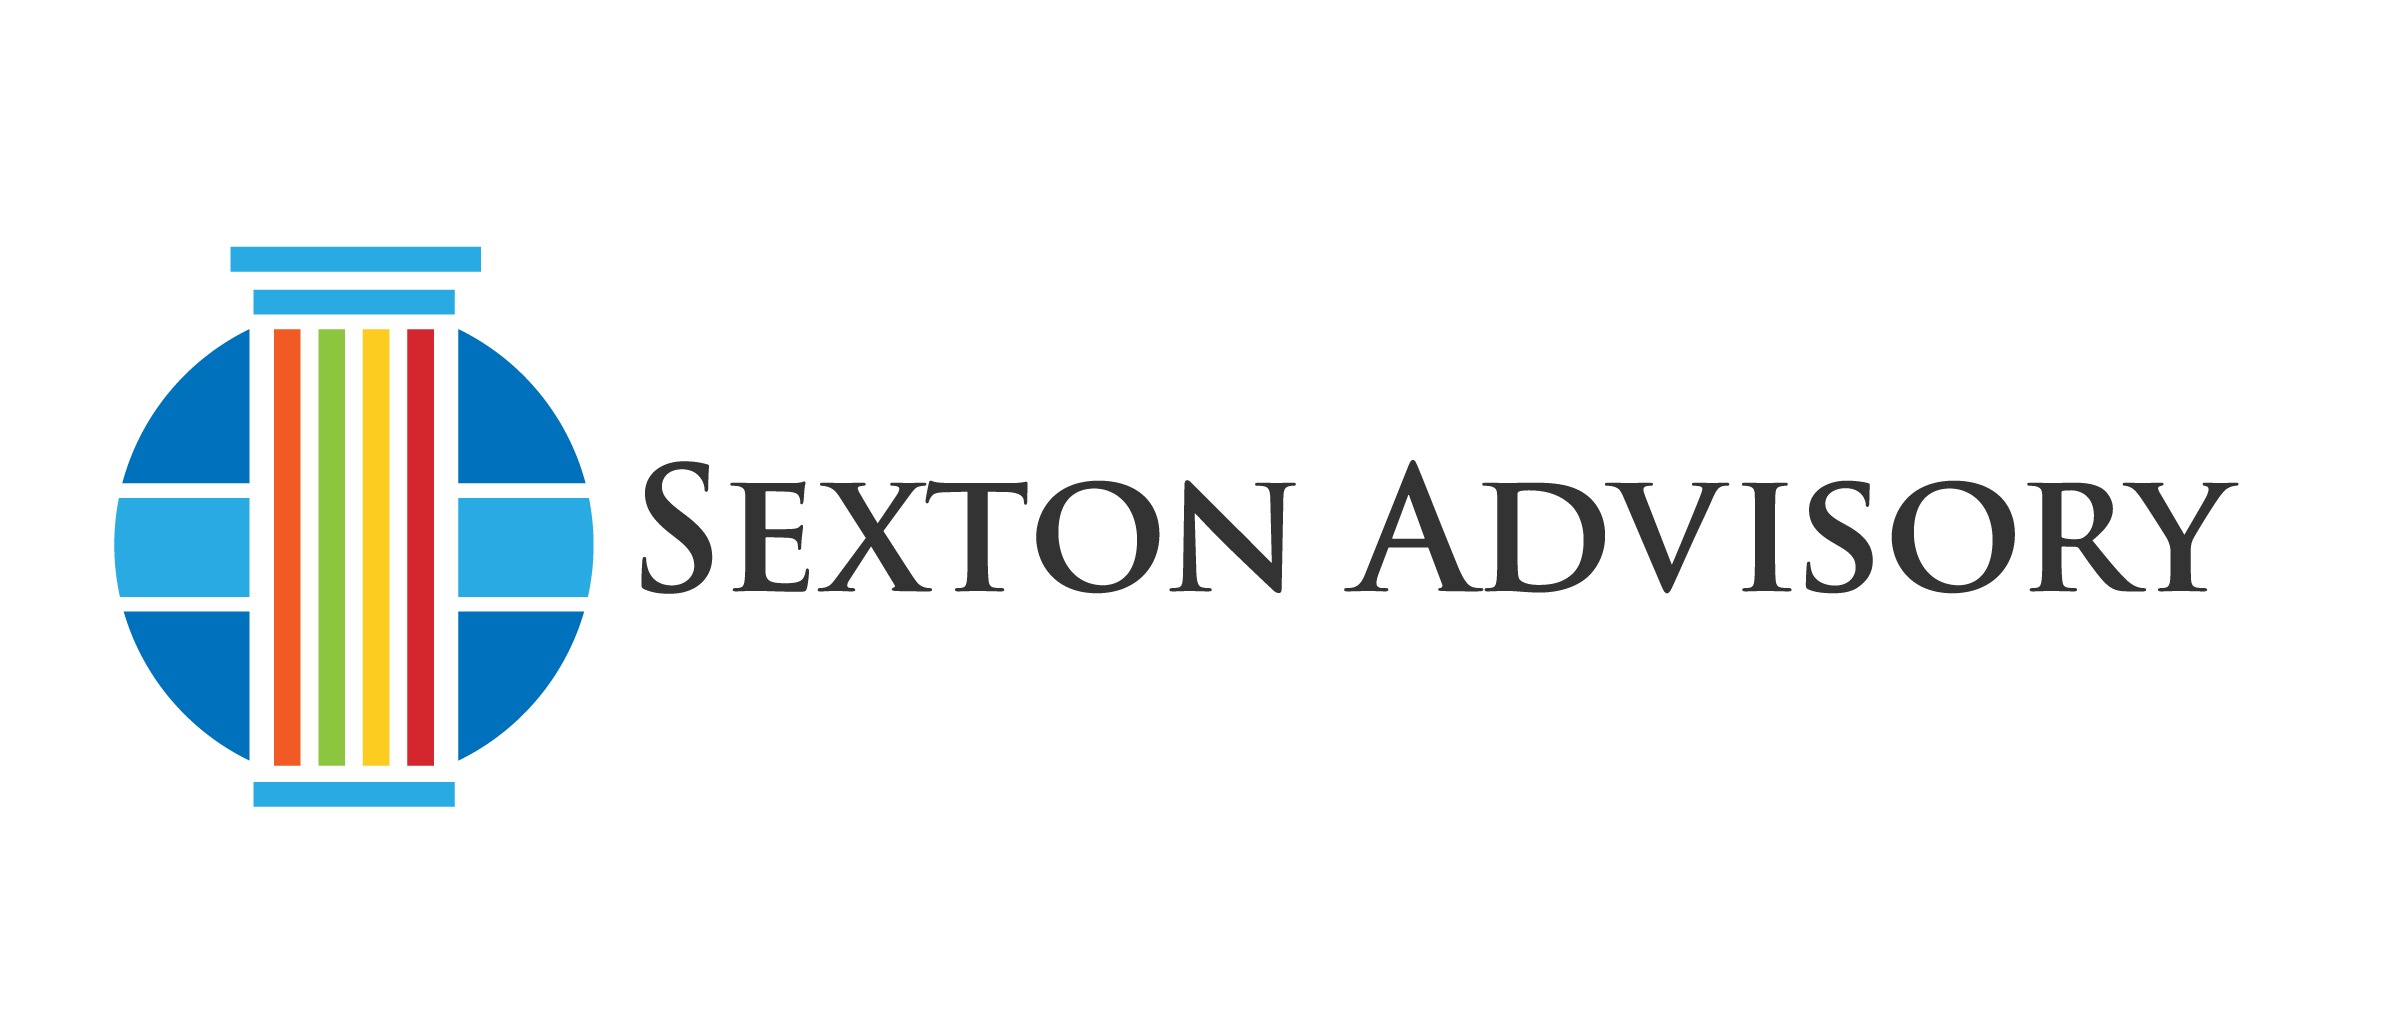 Sexton Advisory